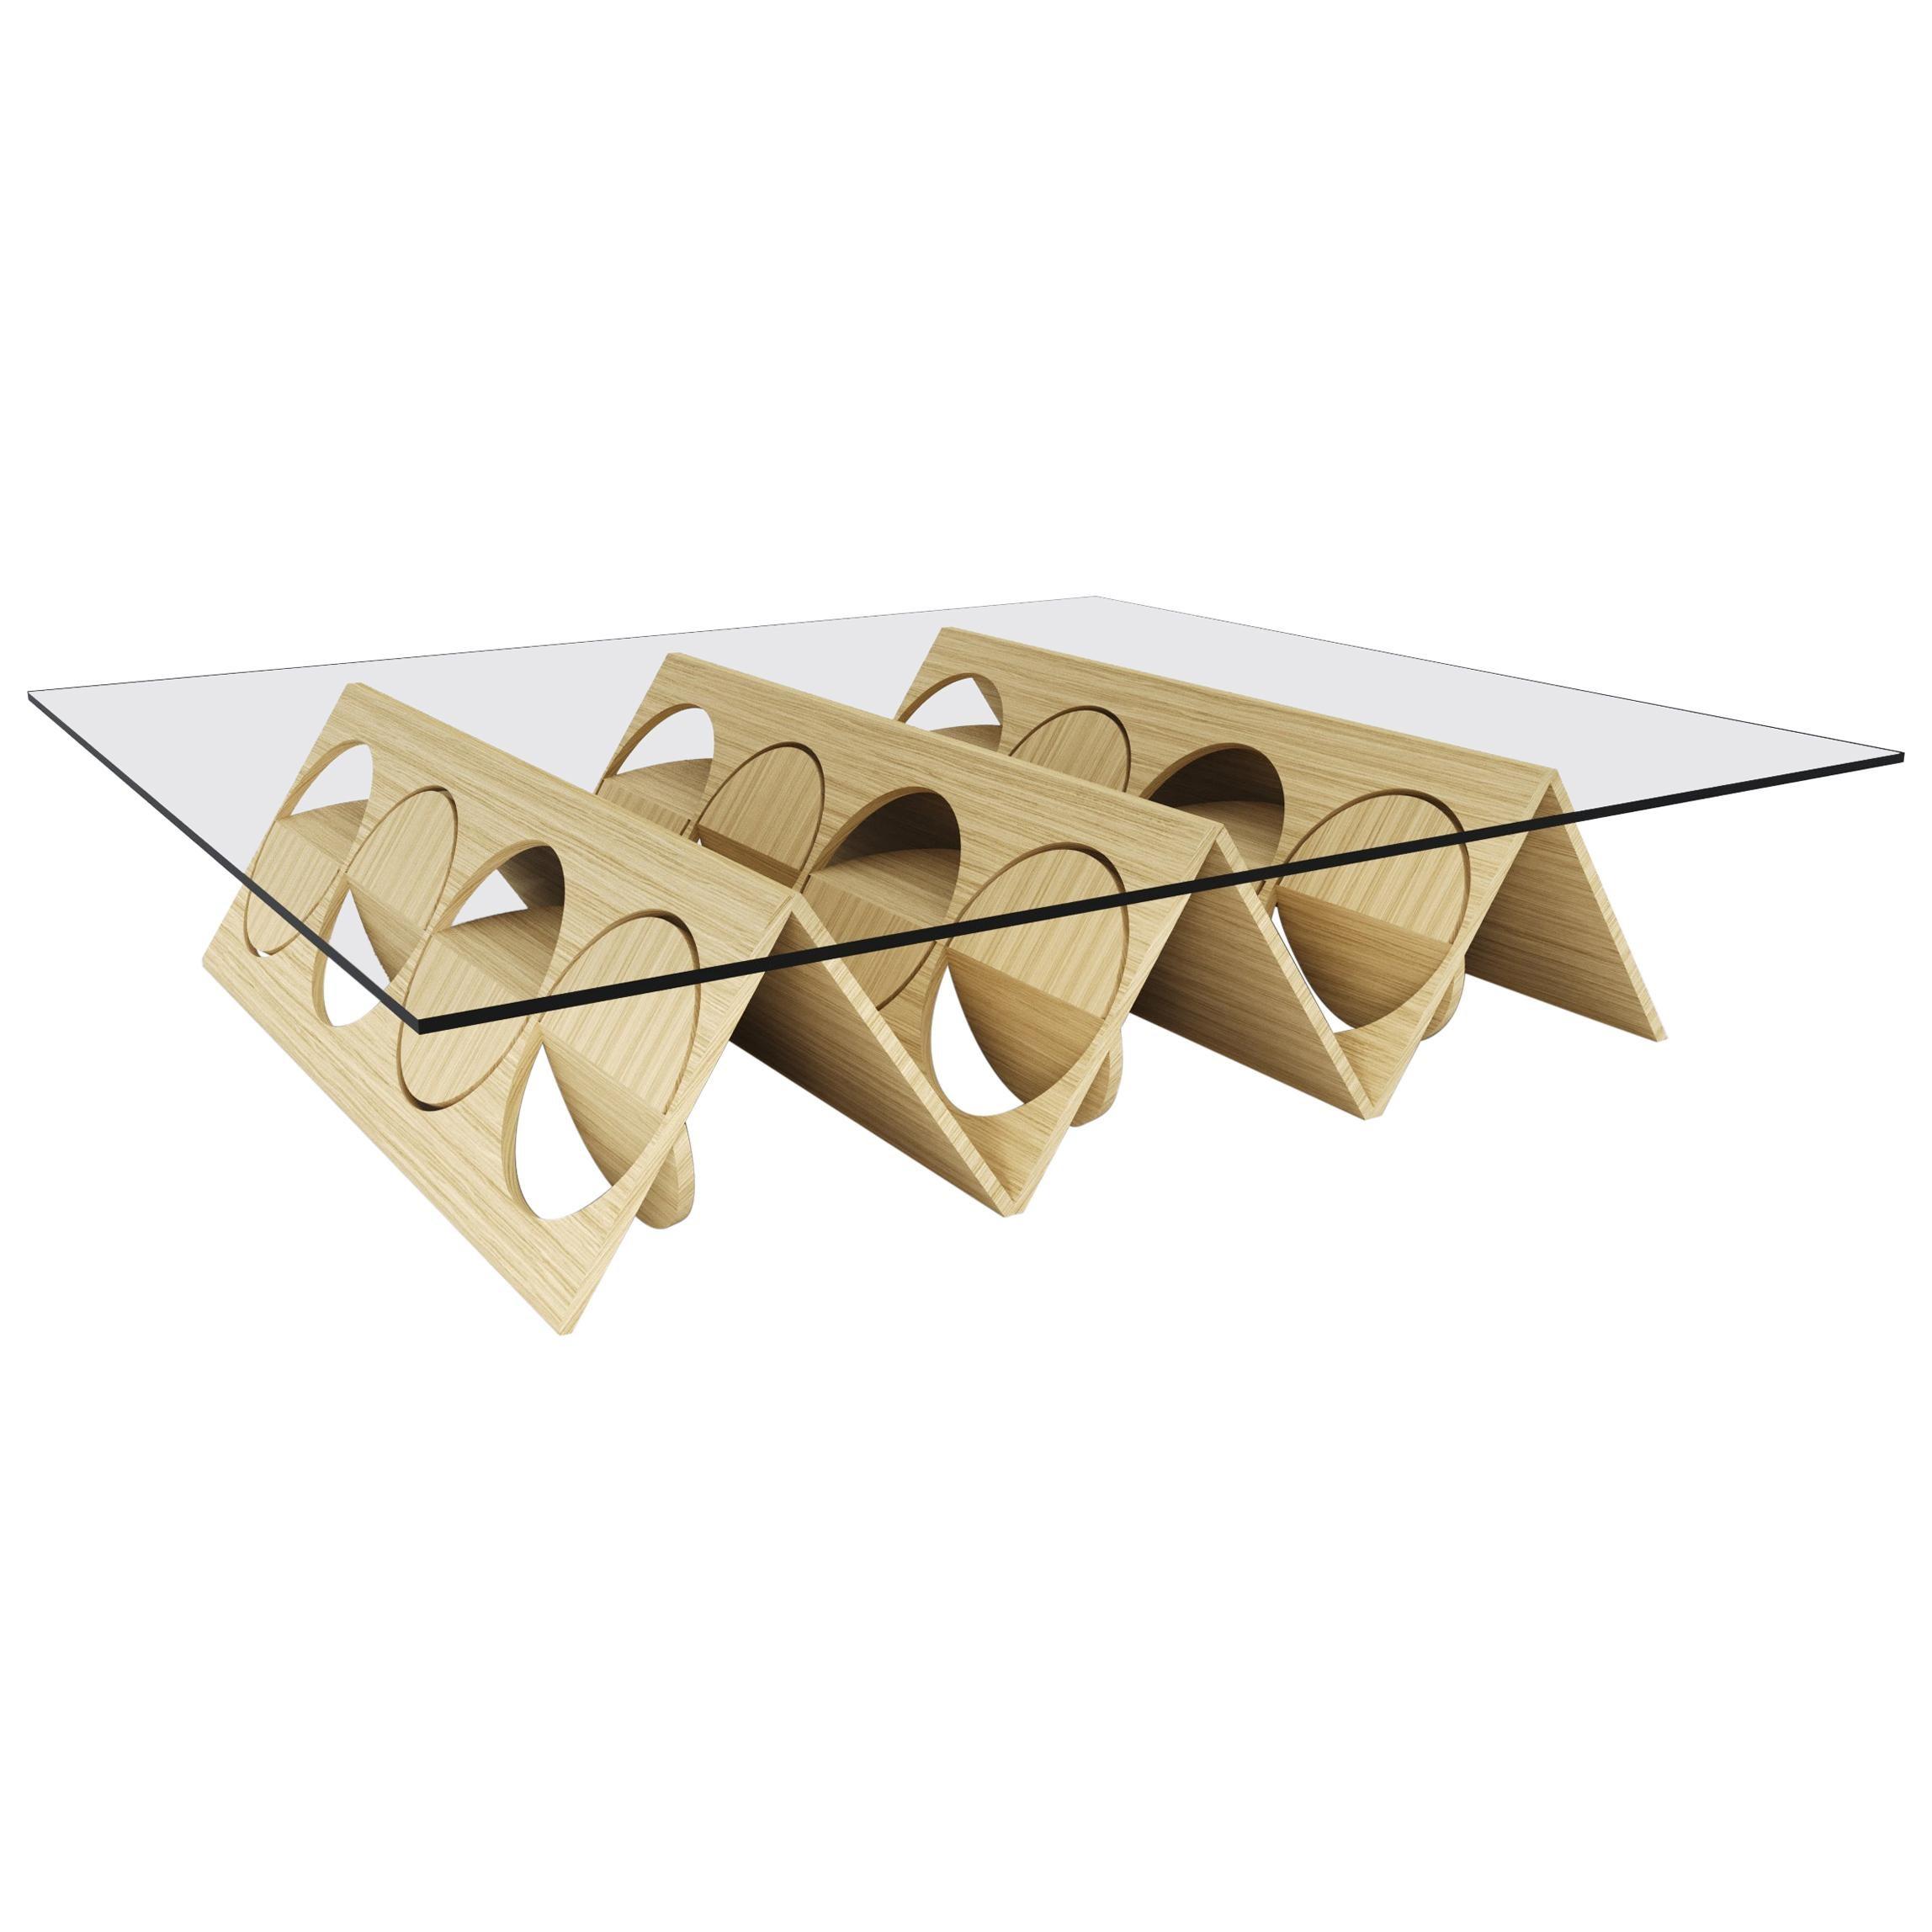 Geometric Modular Coffee Table Oak Wood Glass on top by Ana Volante